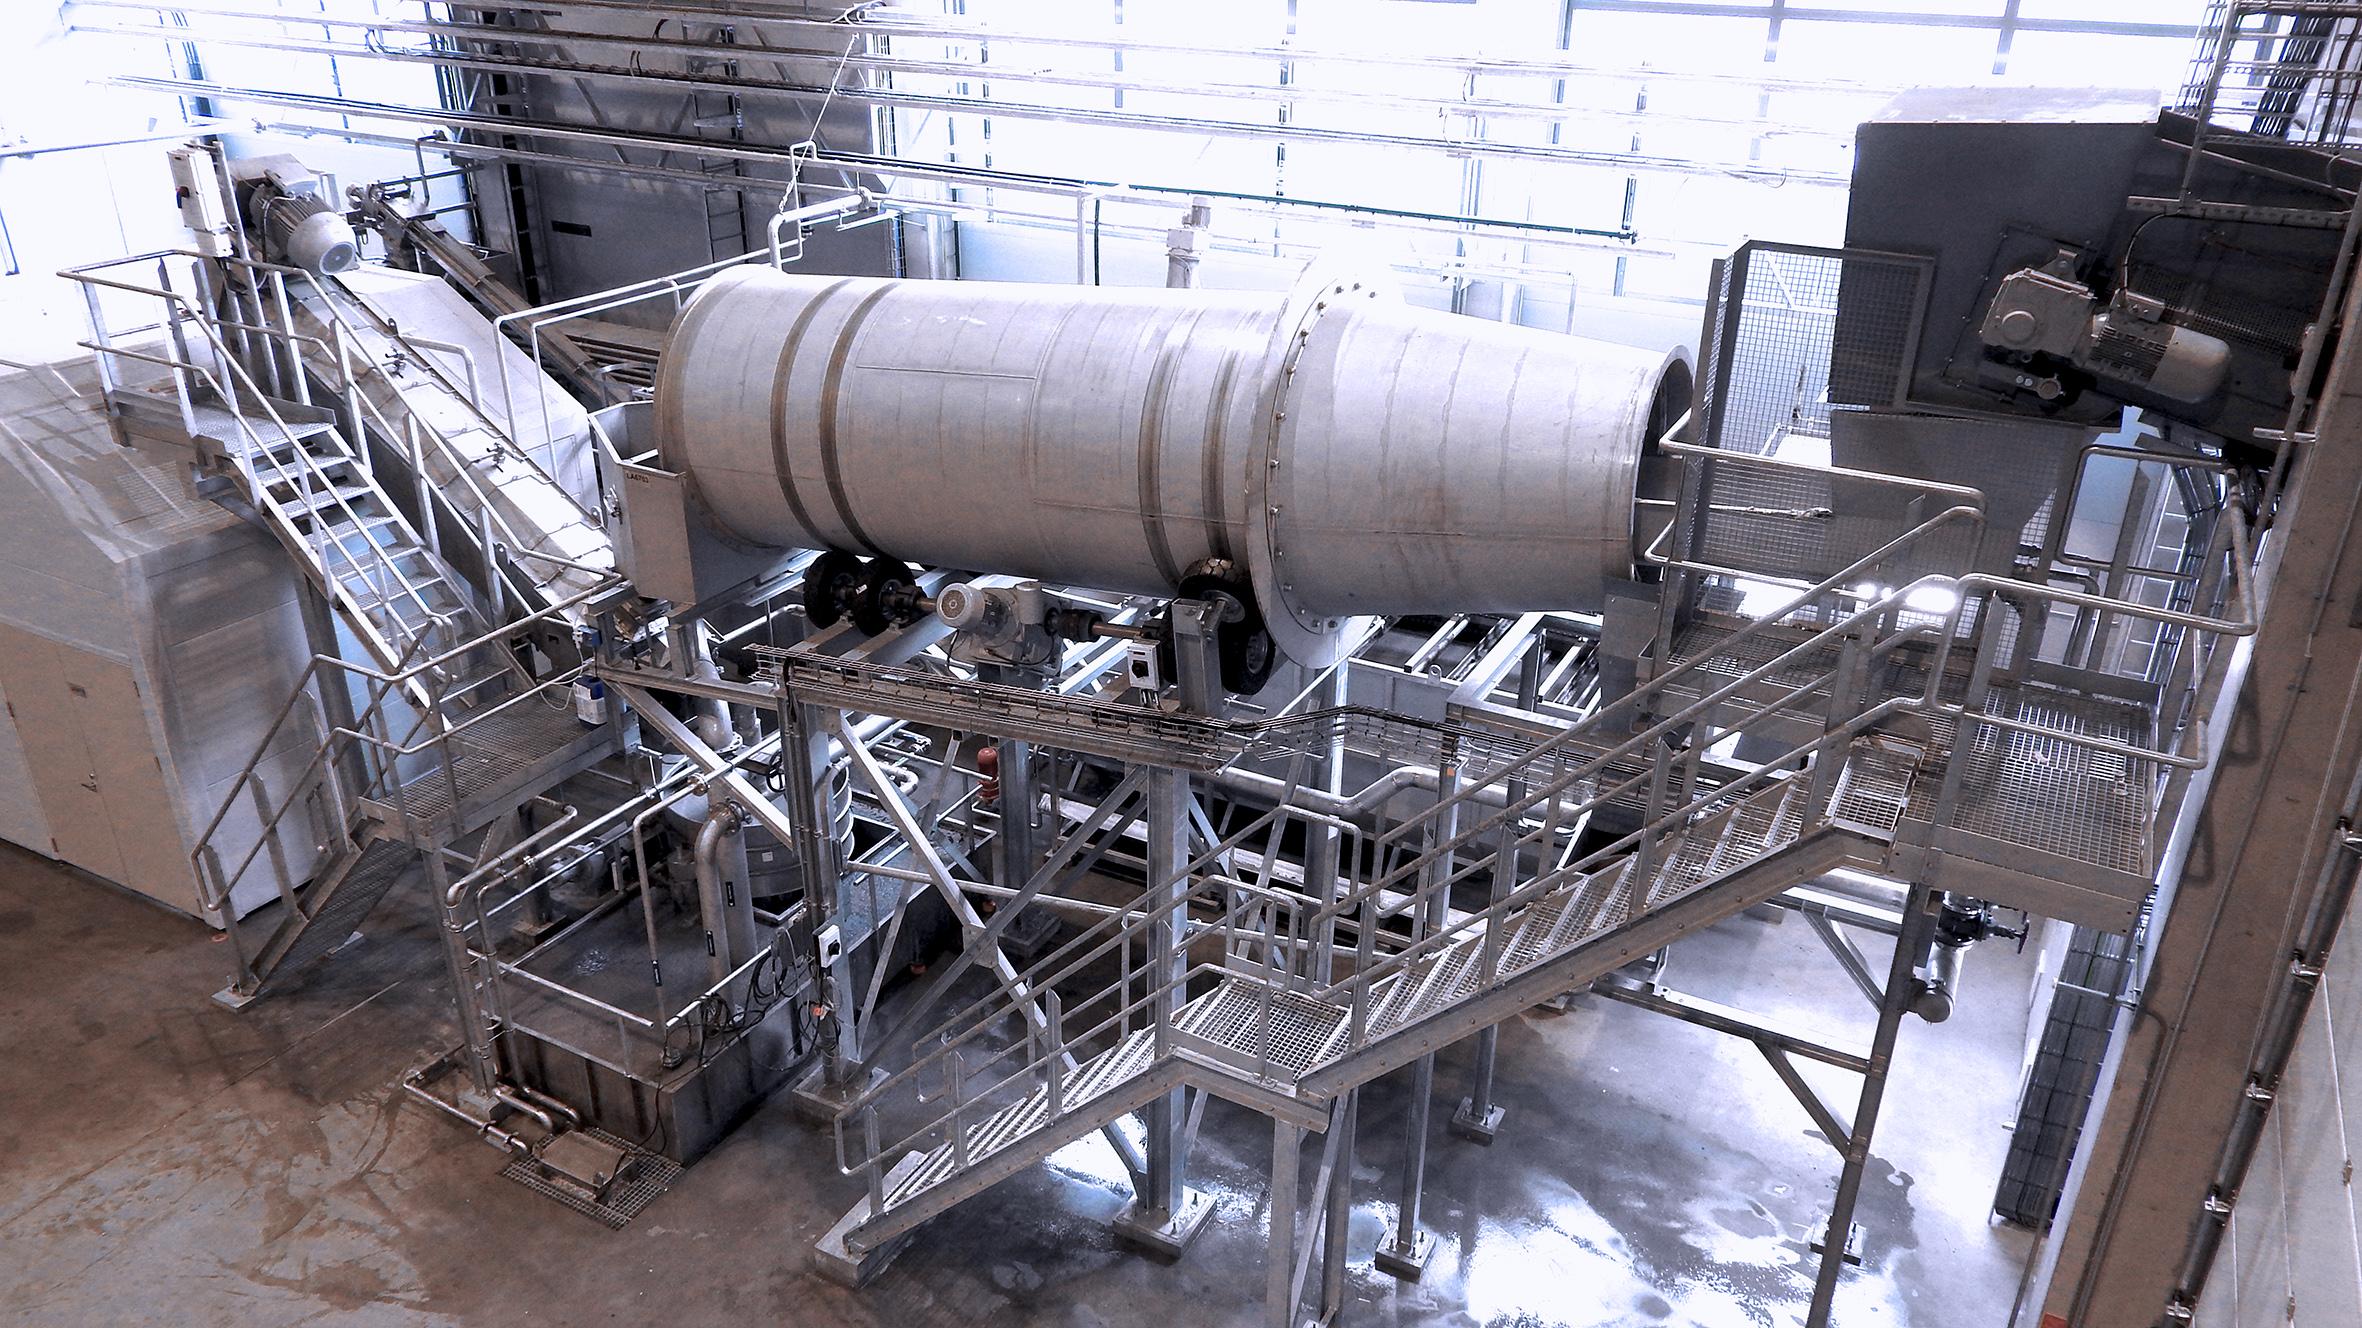 Installation de recyclage combiné pour PE, PP, LDPE, LLDPE